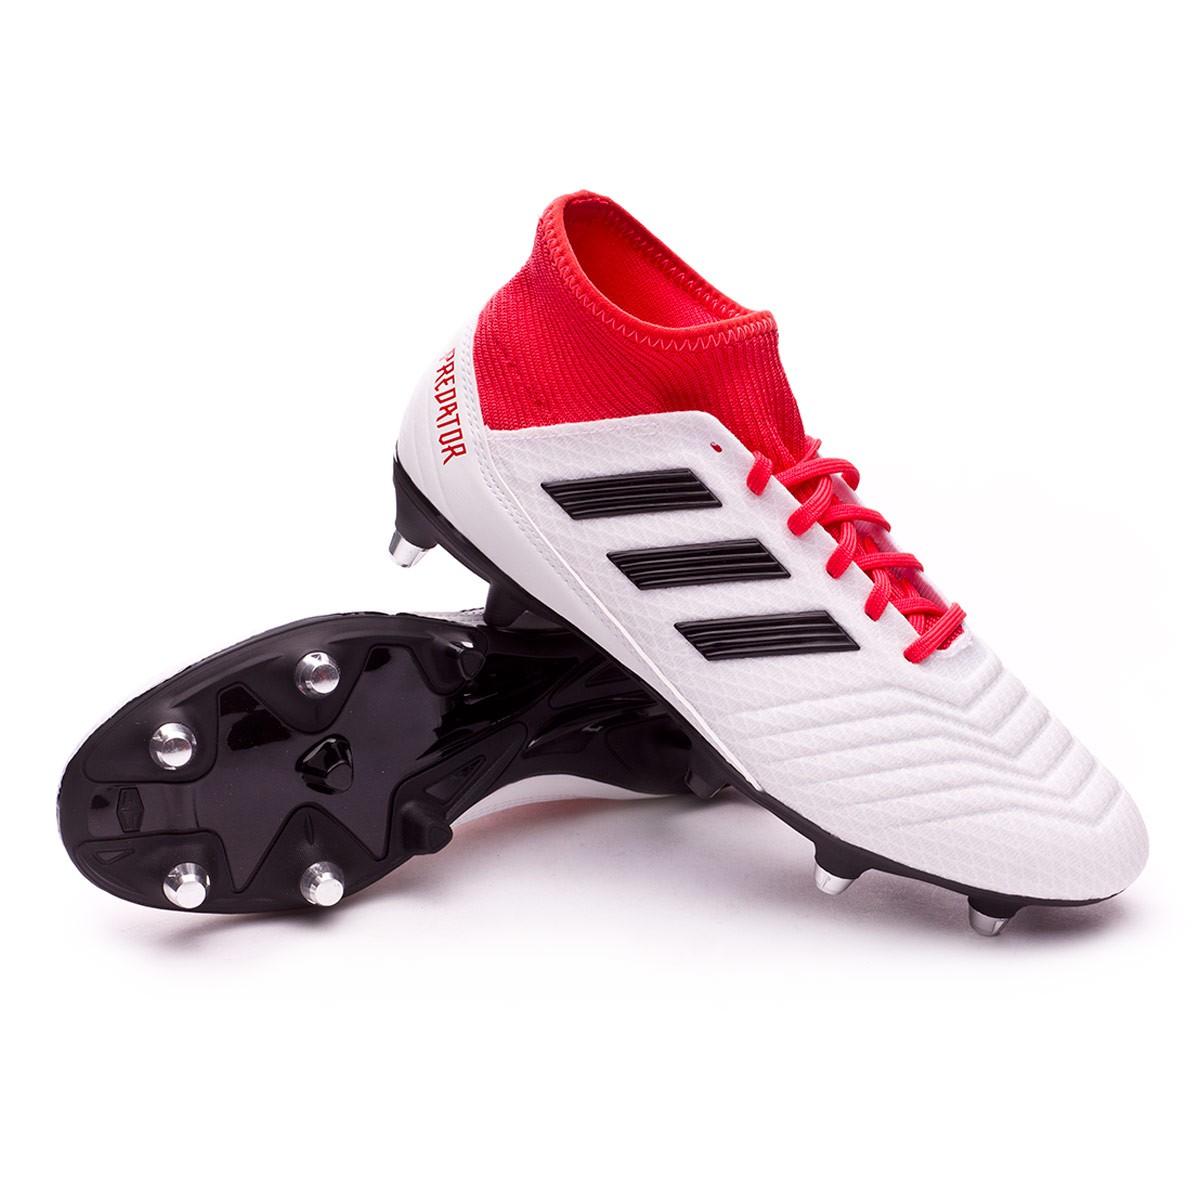 online retailer b18e7 efa47 Categorías de la Bota de fútbol